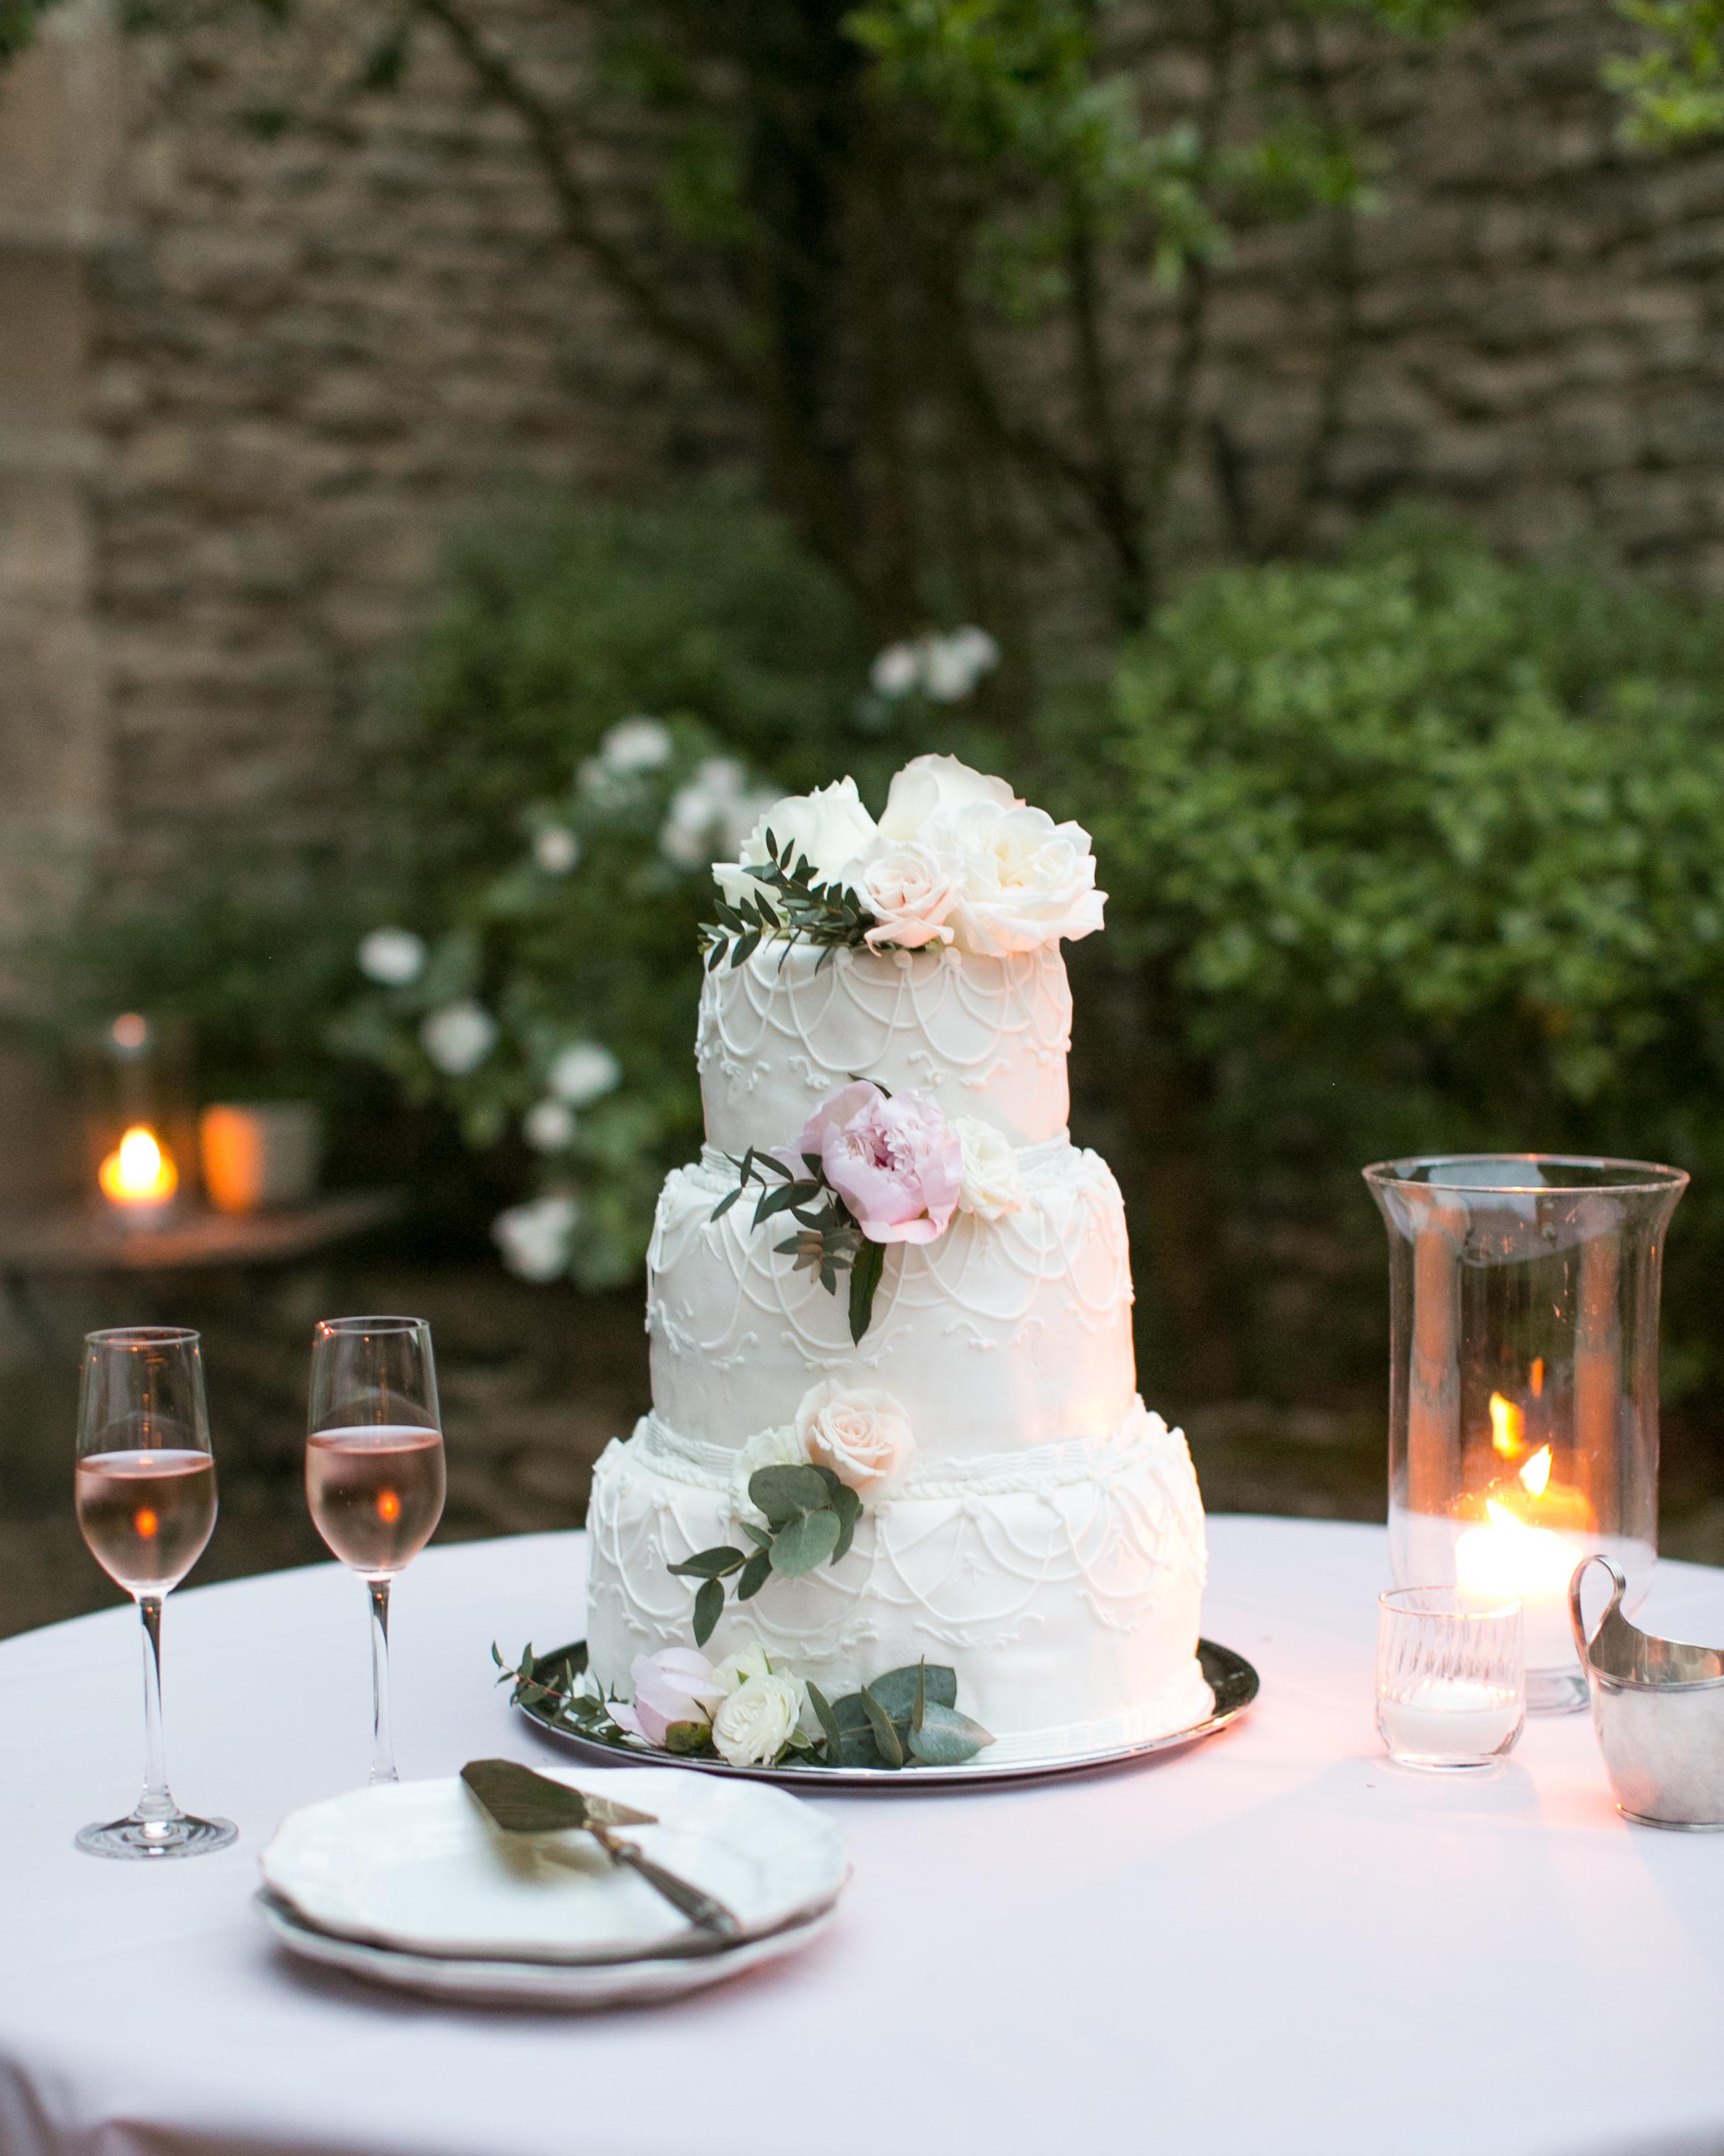 julie-chris-wedding-cake-0577-s12649-0216.jpg